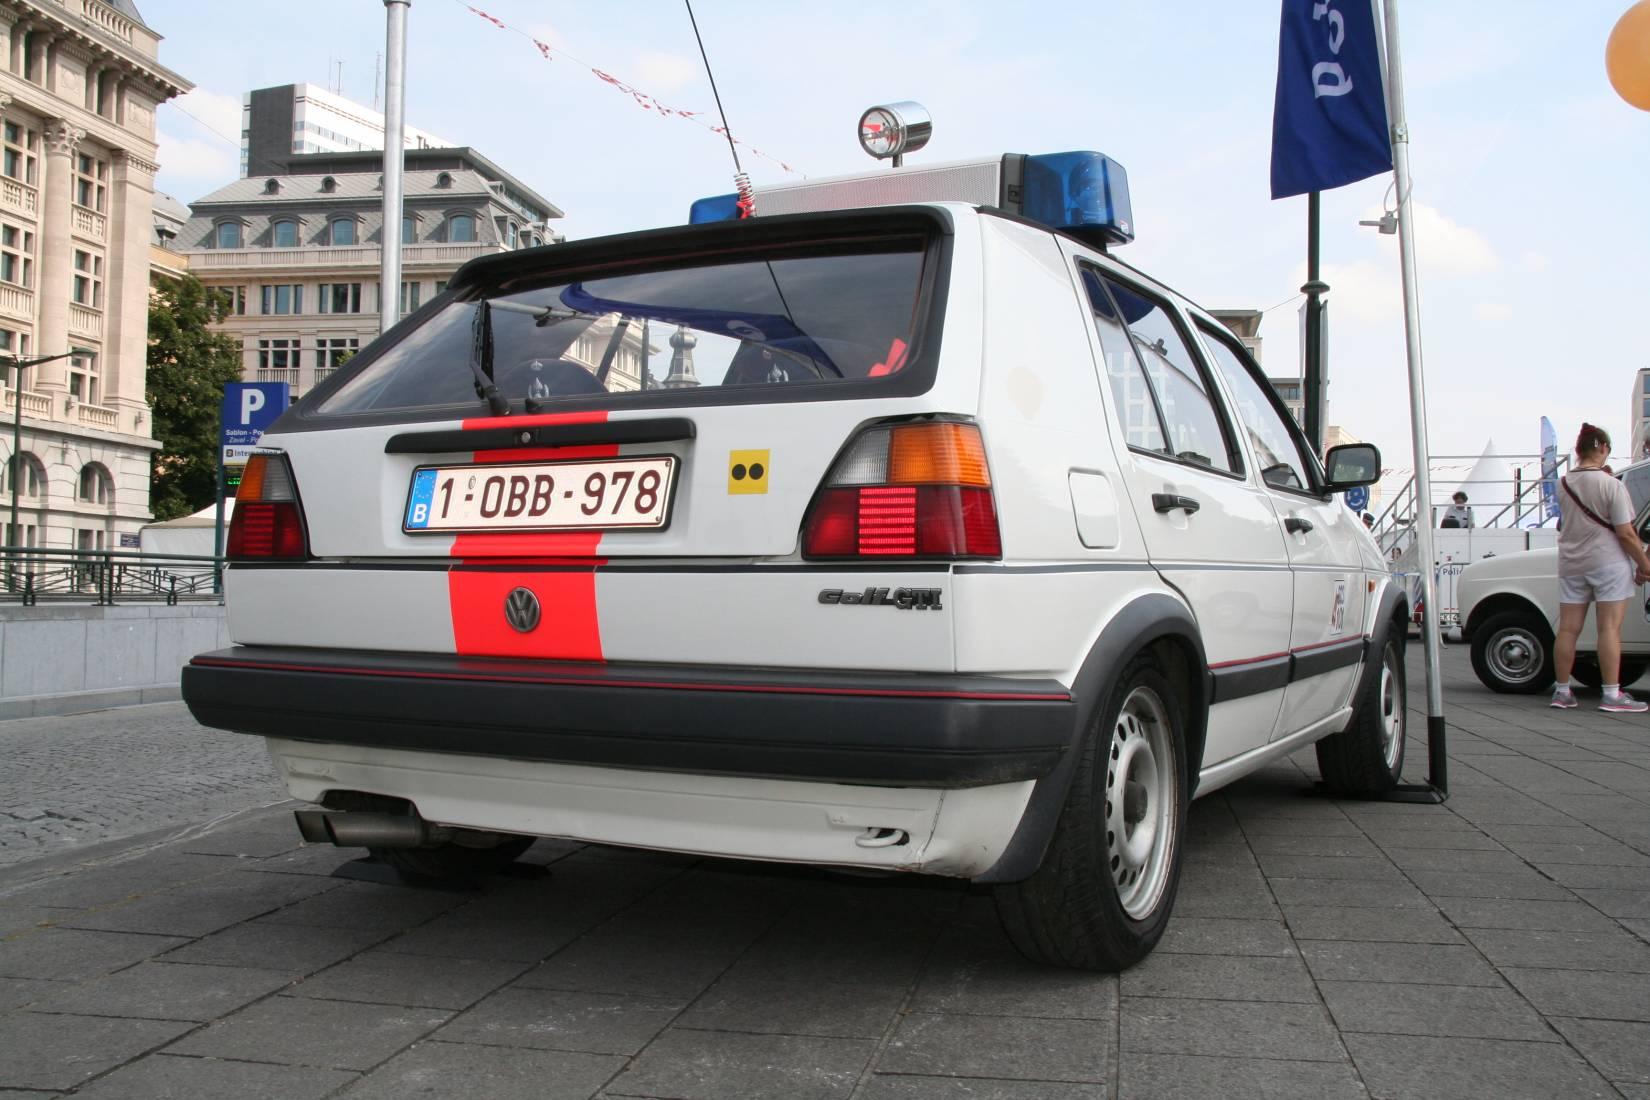 Fte_nationale_belge__Bruxelles_le_21_juillet_2016_34_-_Volkswagen_VW_Golf_GTI_de_lancienne_gendarmerie_belge.jpg